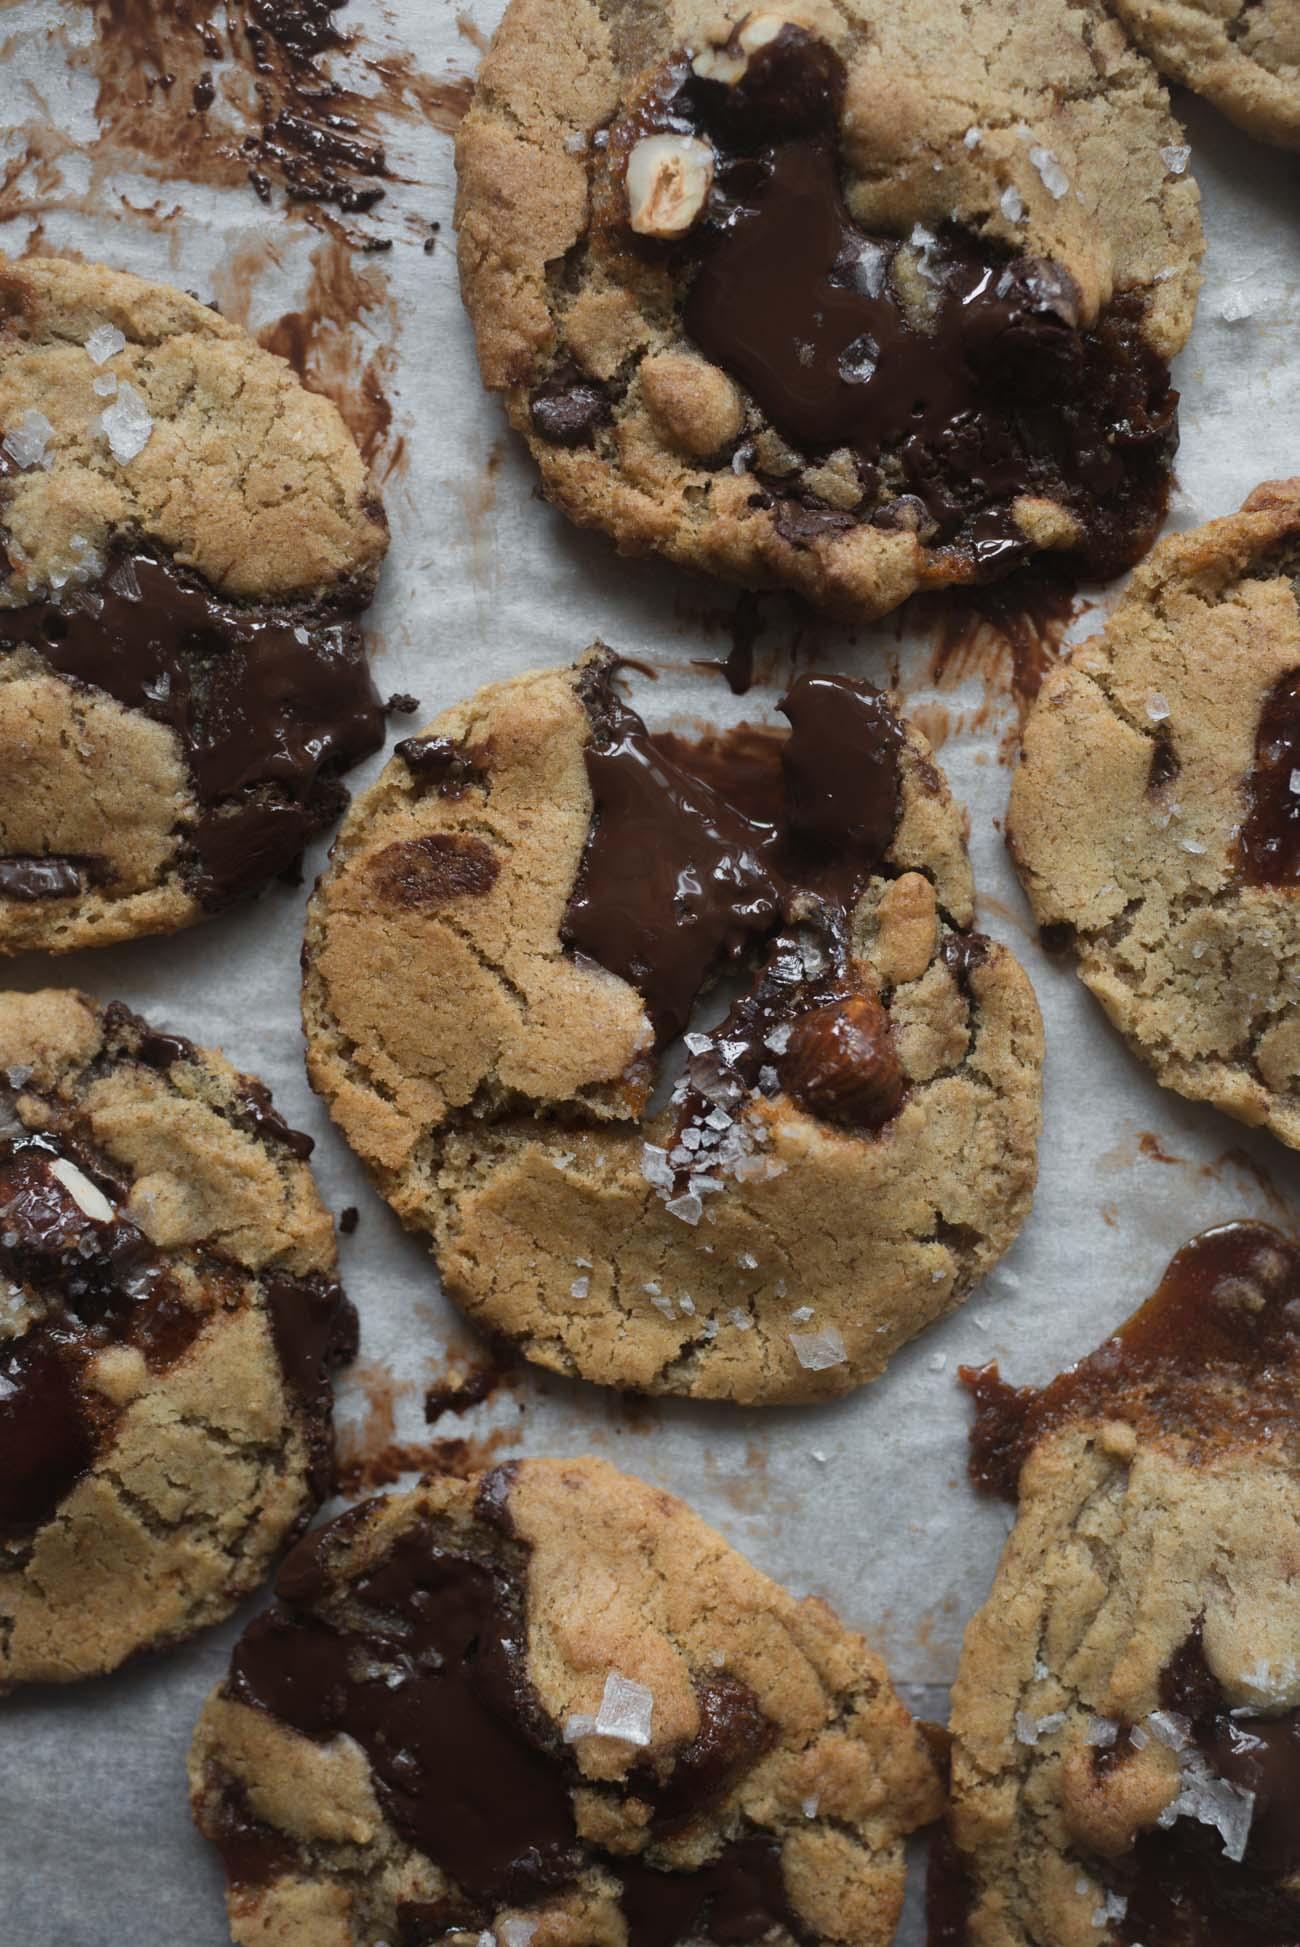 Hazelnut-Praline-and-Rye-Chocolate-Chunk-Cookies-1.jpg